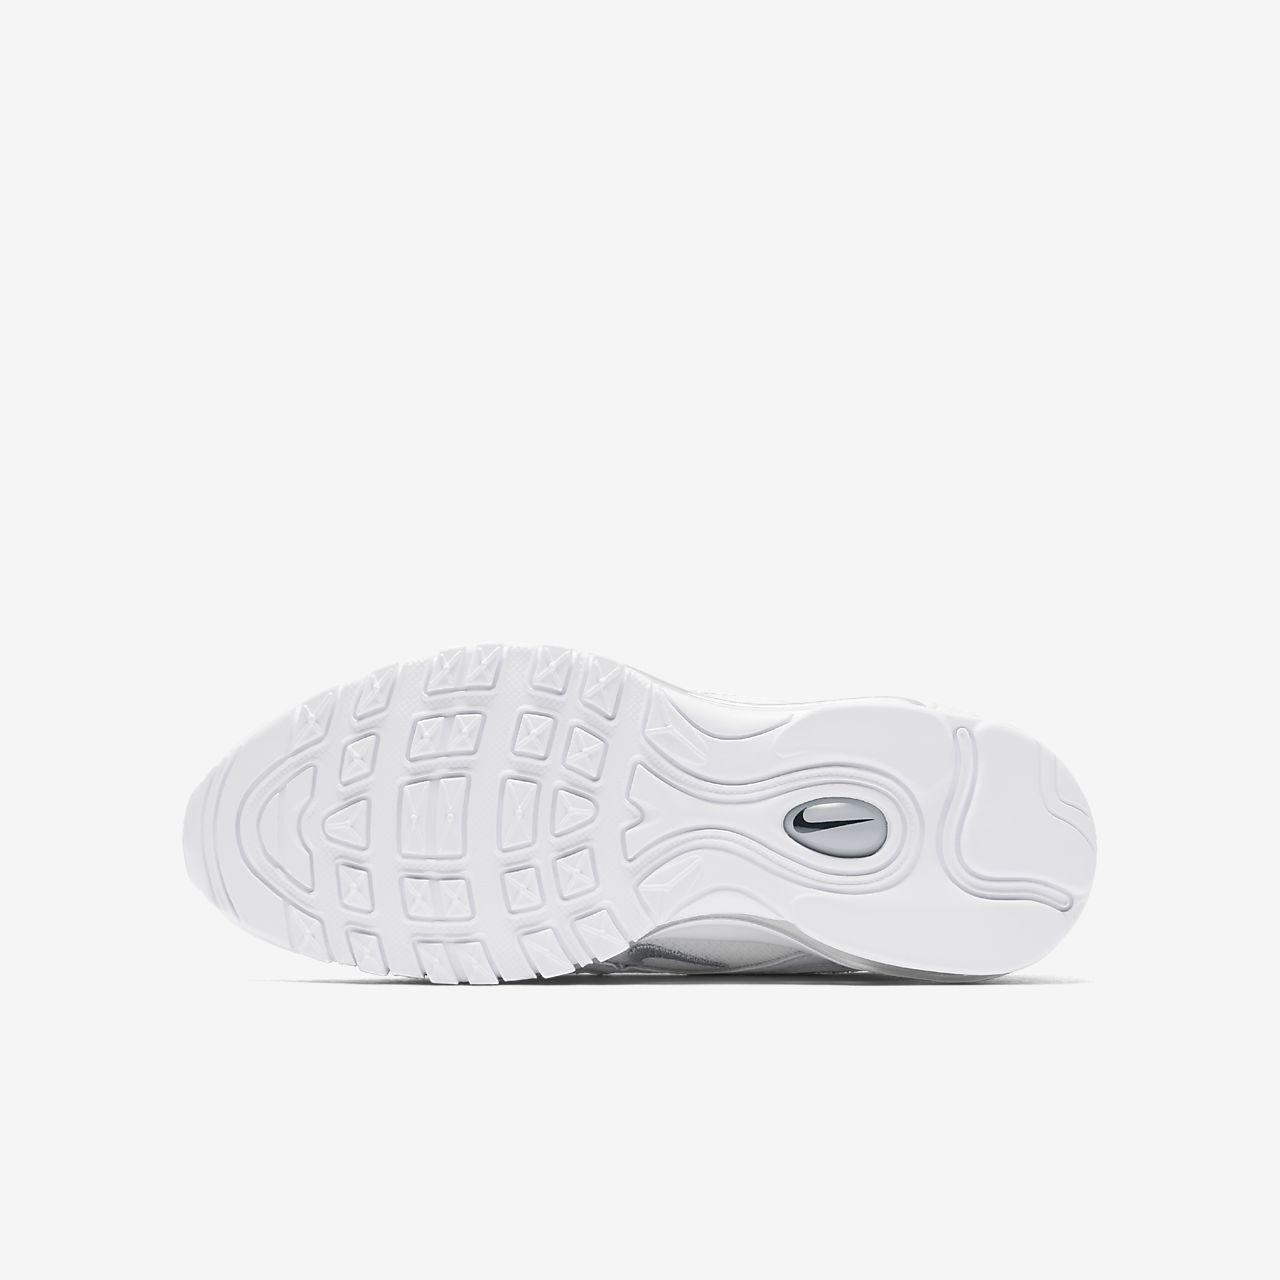 huge discount 8125d d64a1 ... Nike Air Max 97 Schuh für ältere Kinder